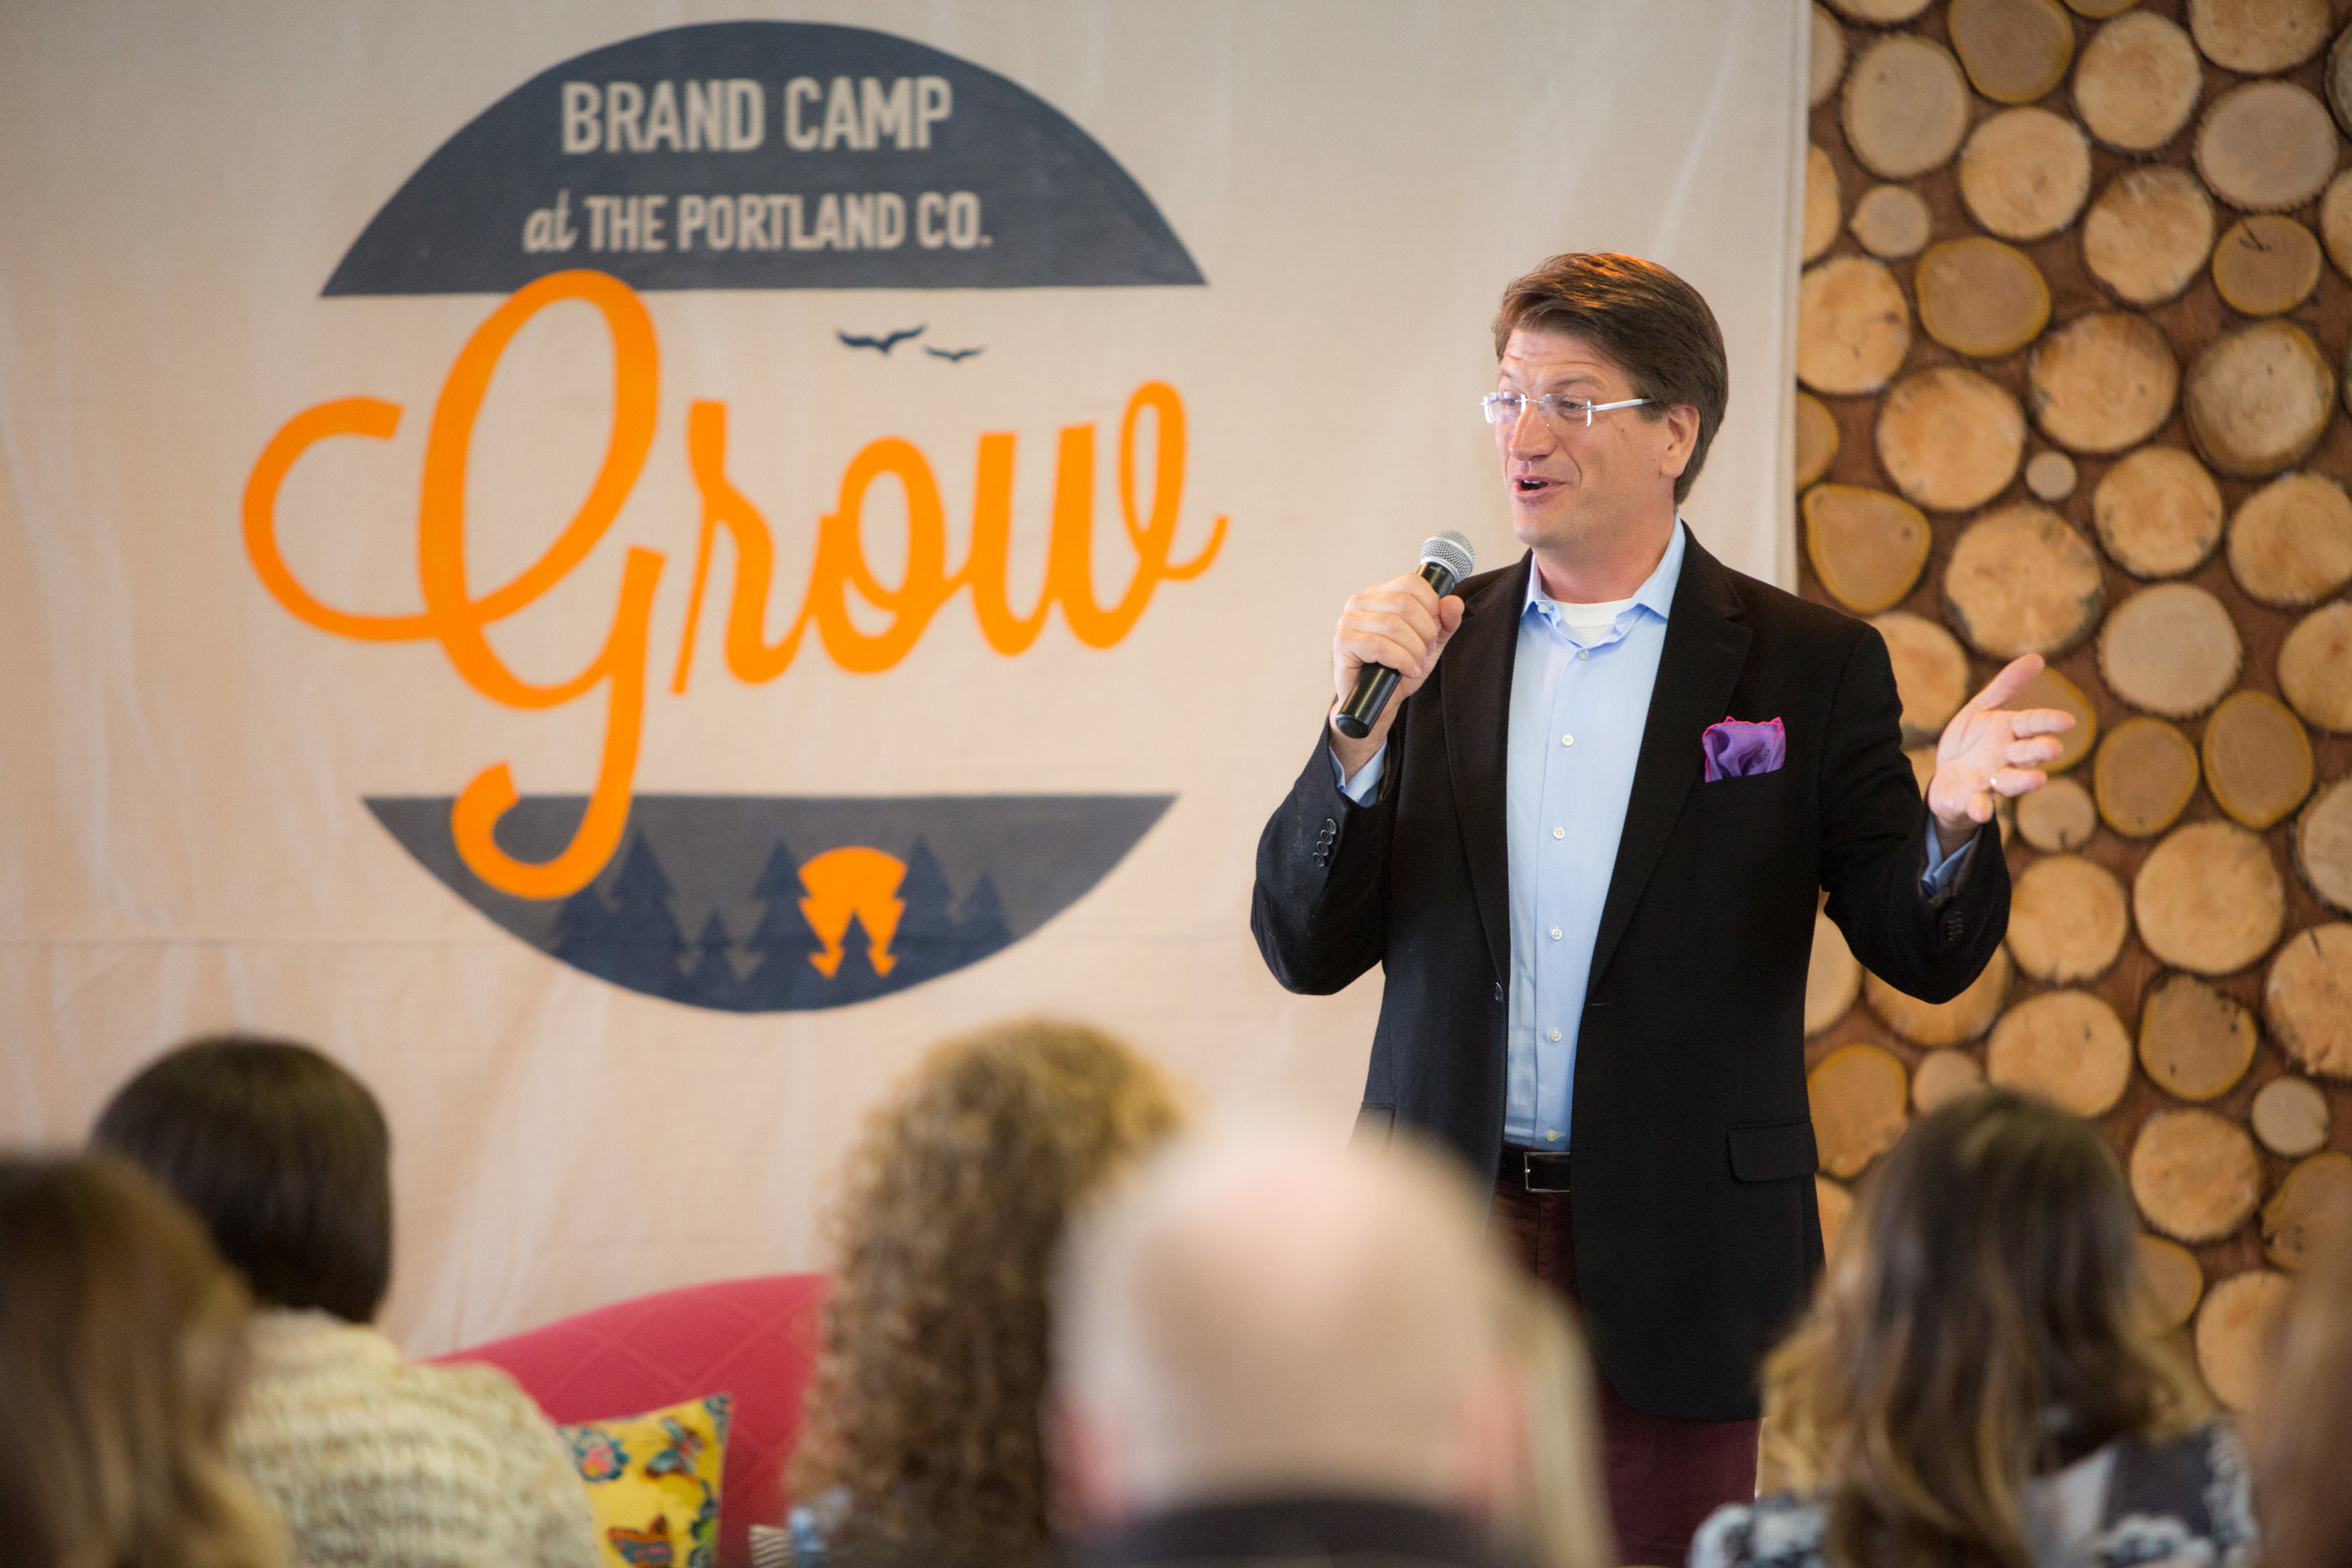 grow_brand_camp_2014_0050 copy.JPG